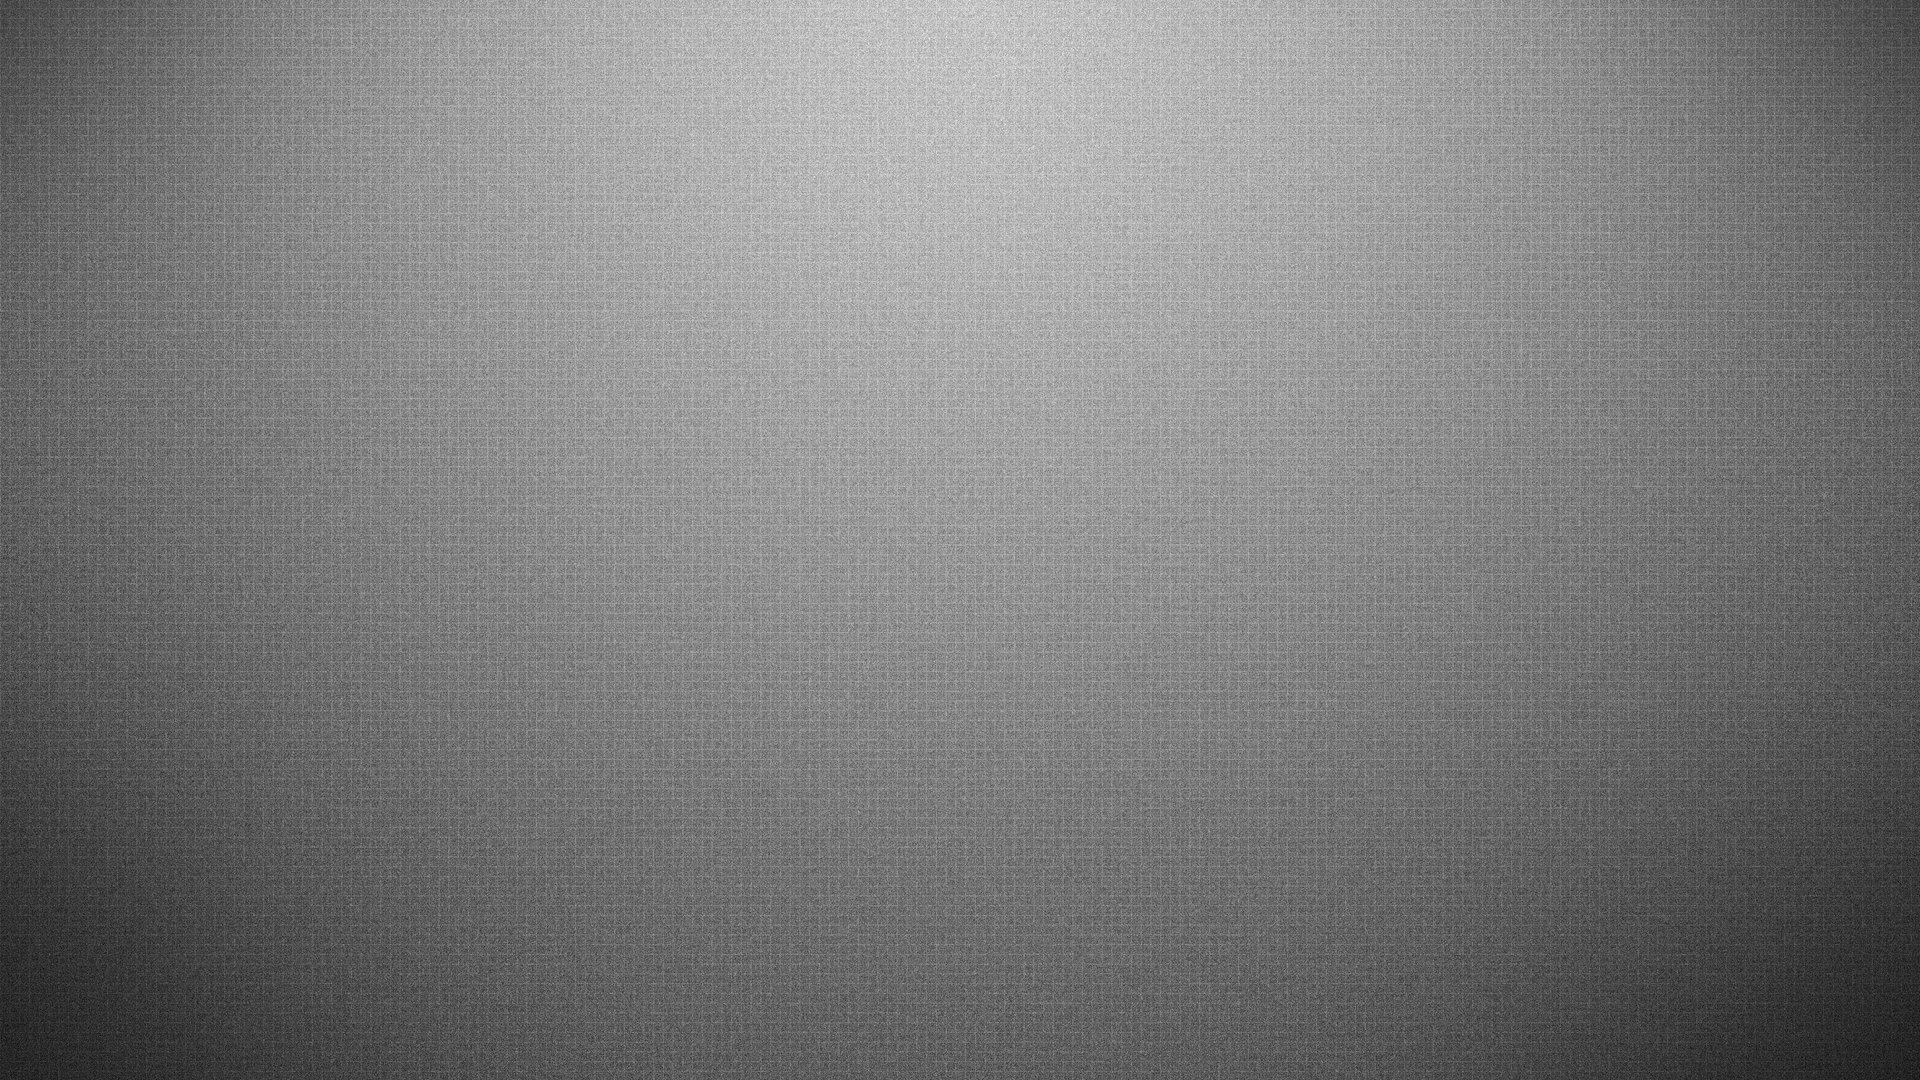 Grey Texture Background Image